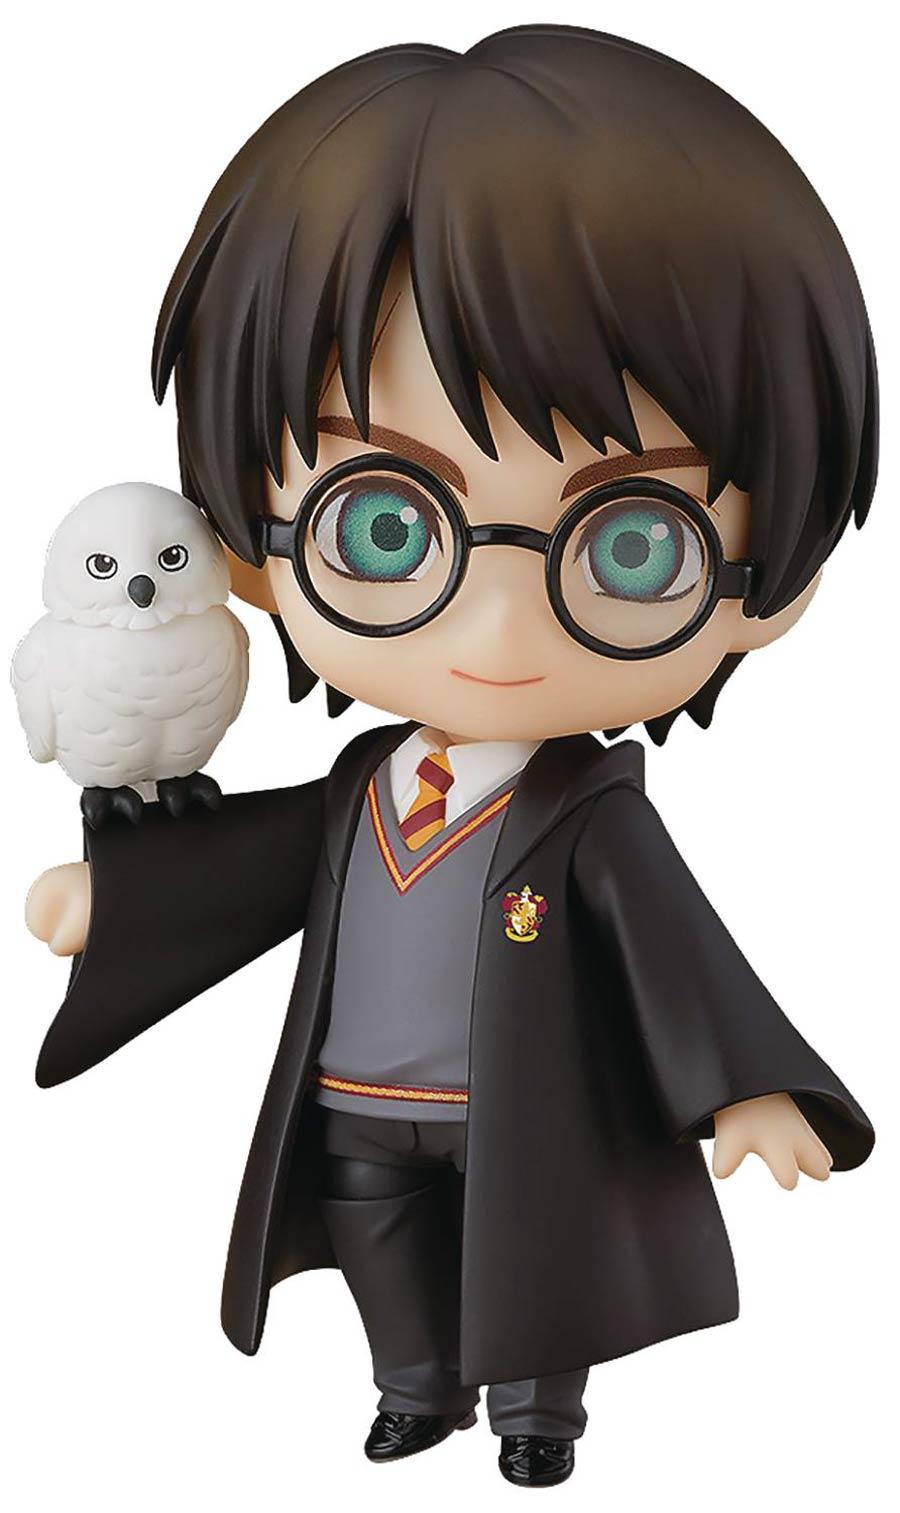 Harry Potter Harry Potter Nendoroid